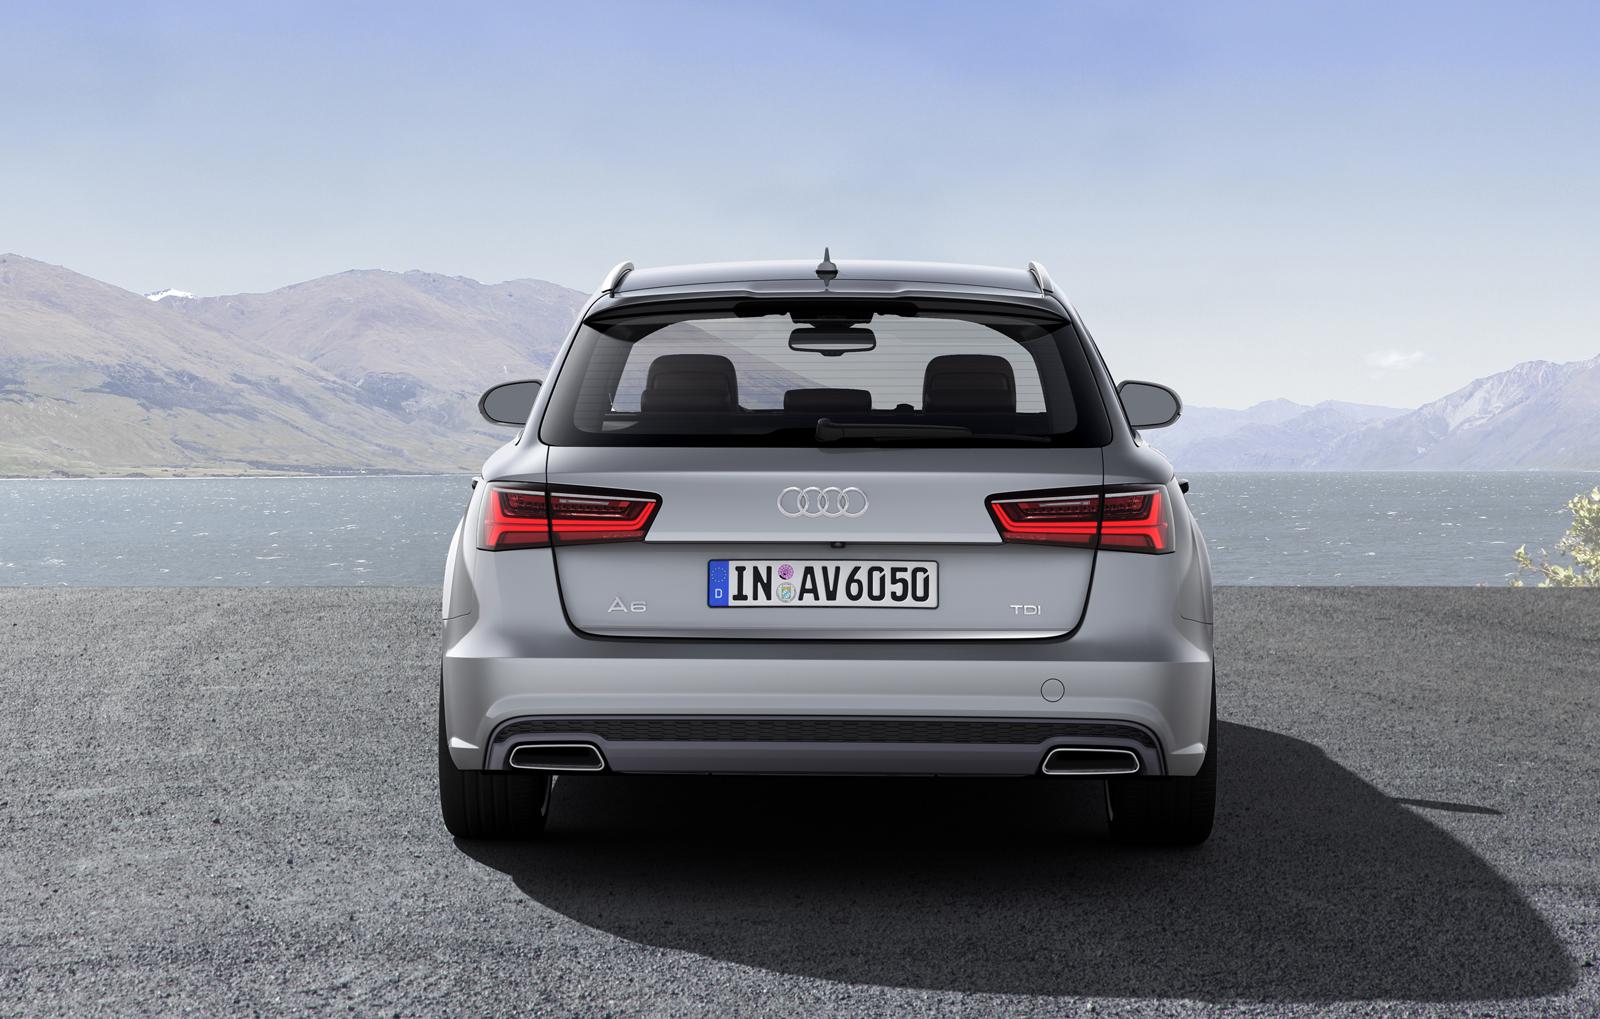 Фото | Универсал Audi A6 Avant 2016